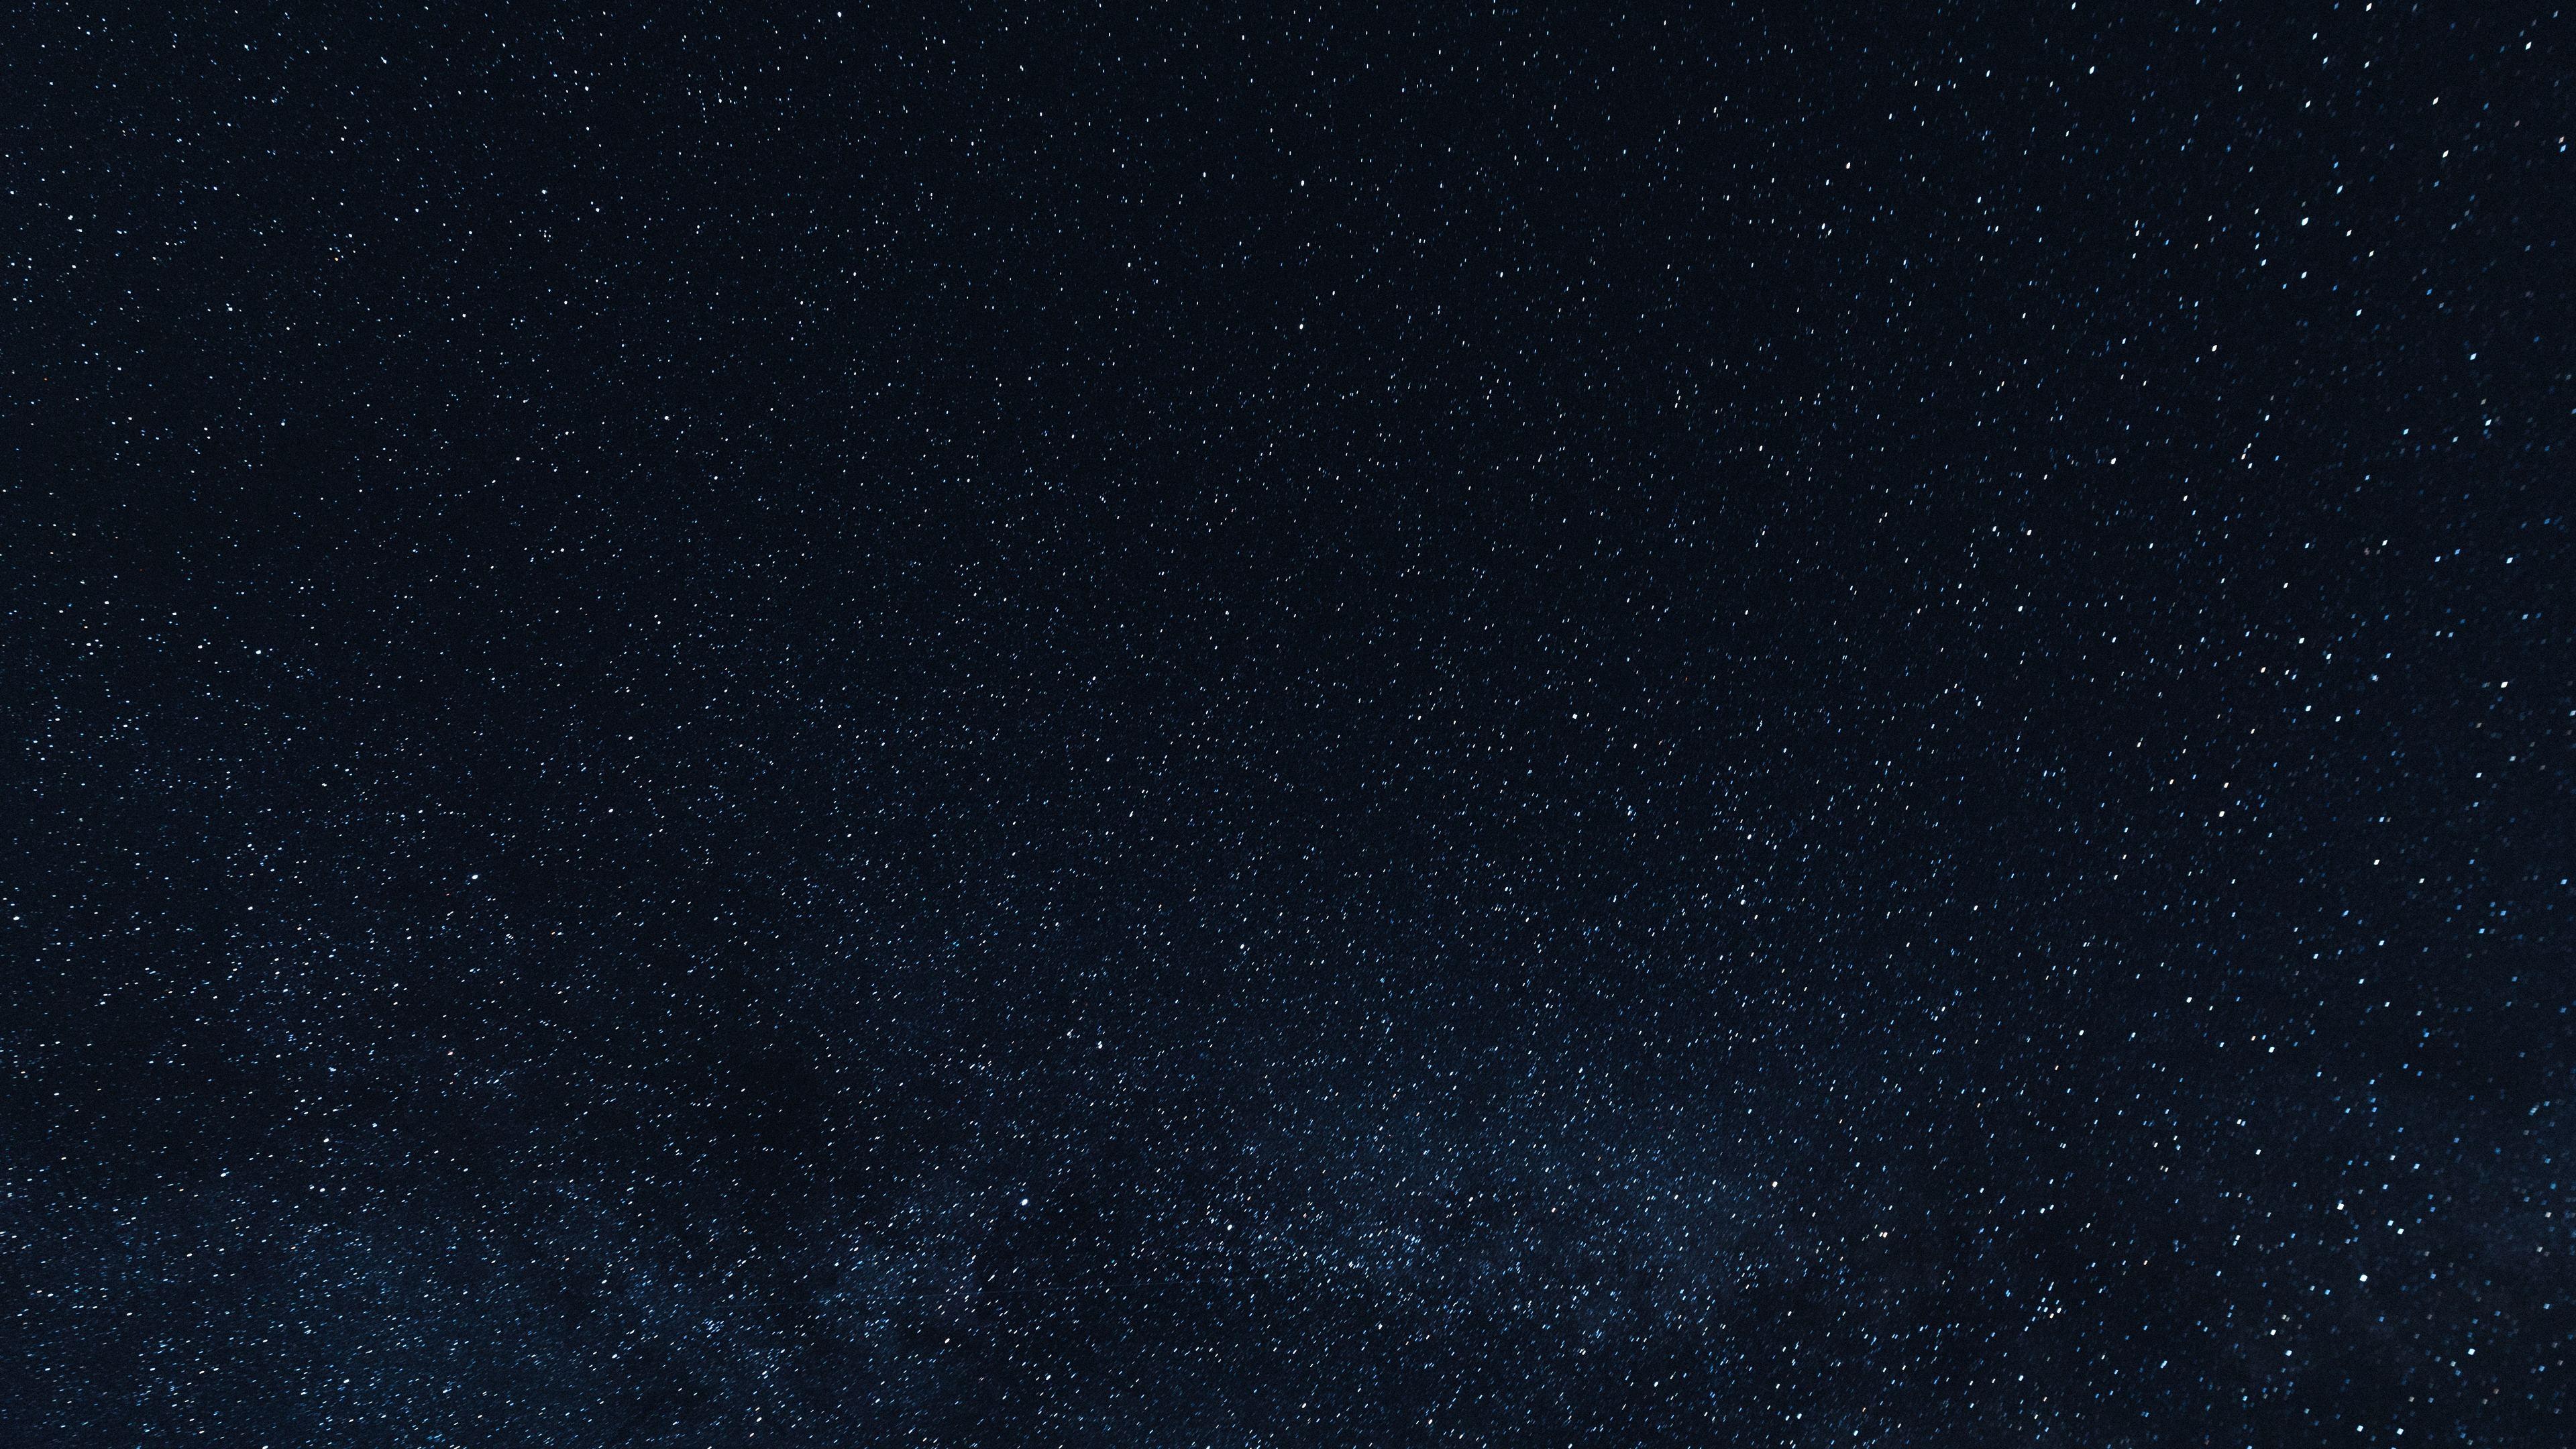 space sky star cosmic night 4k 1540140109 - Space Sky Star Cosmic Night 4k - stars wallpapers, space wallpapers, sky wallpapers, night wallpapers, nature wallpapers, hd-wallpapers, 5k wallpapers, 4k-wallpapers